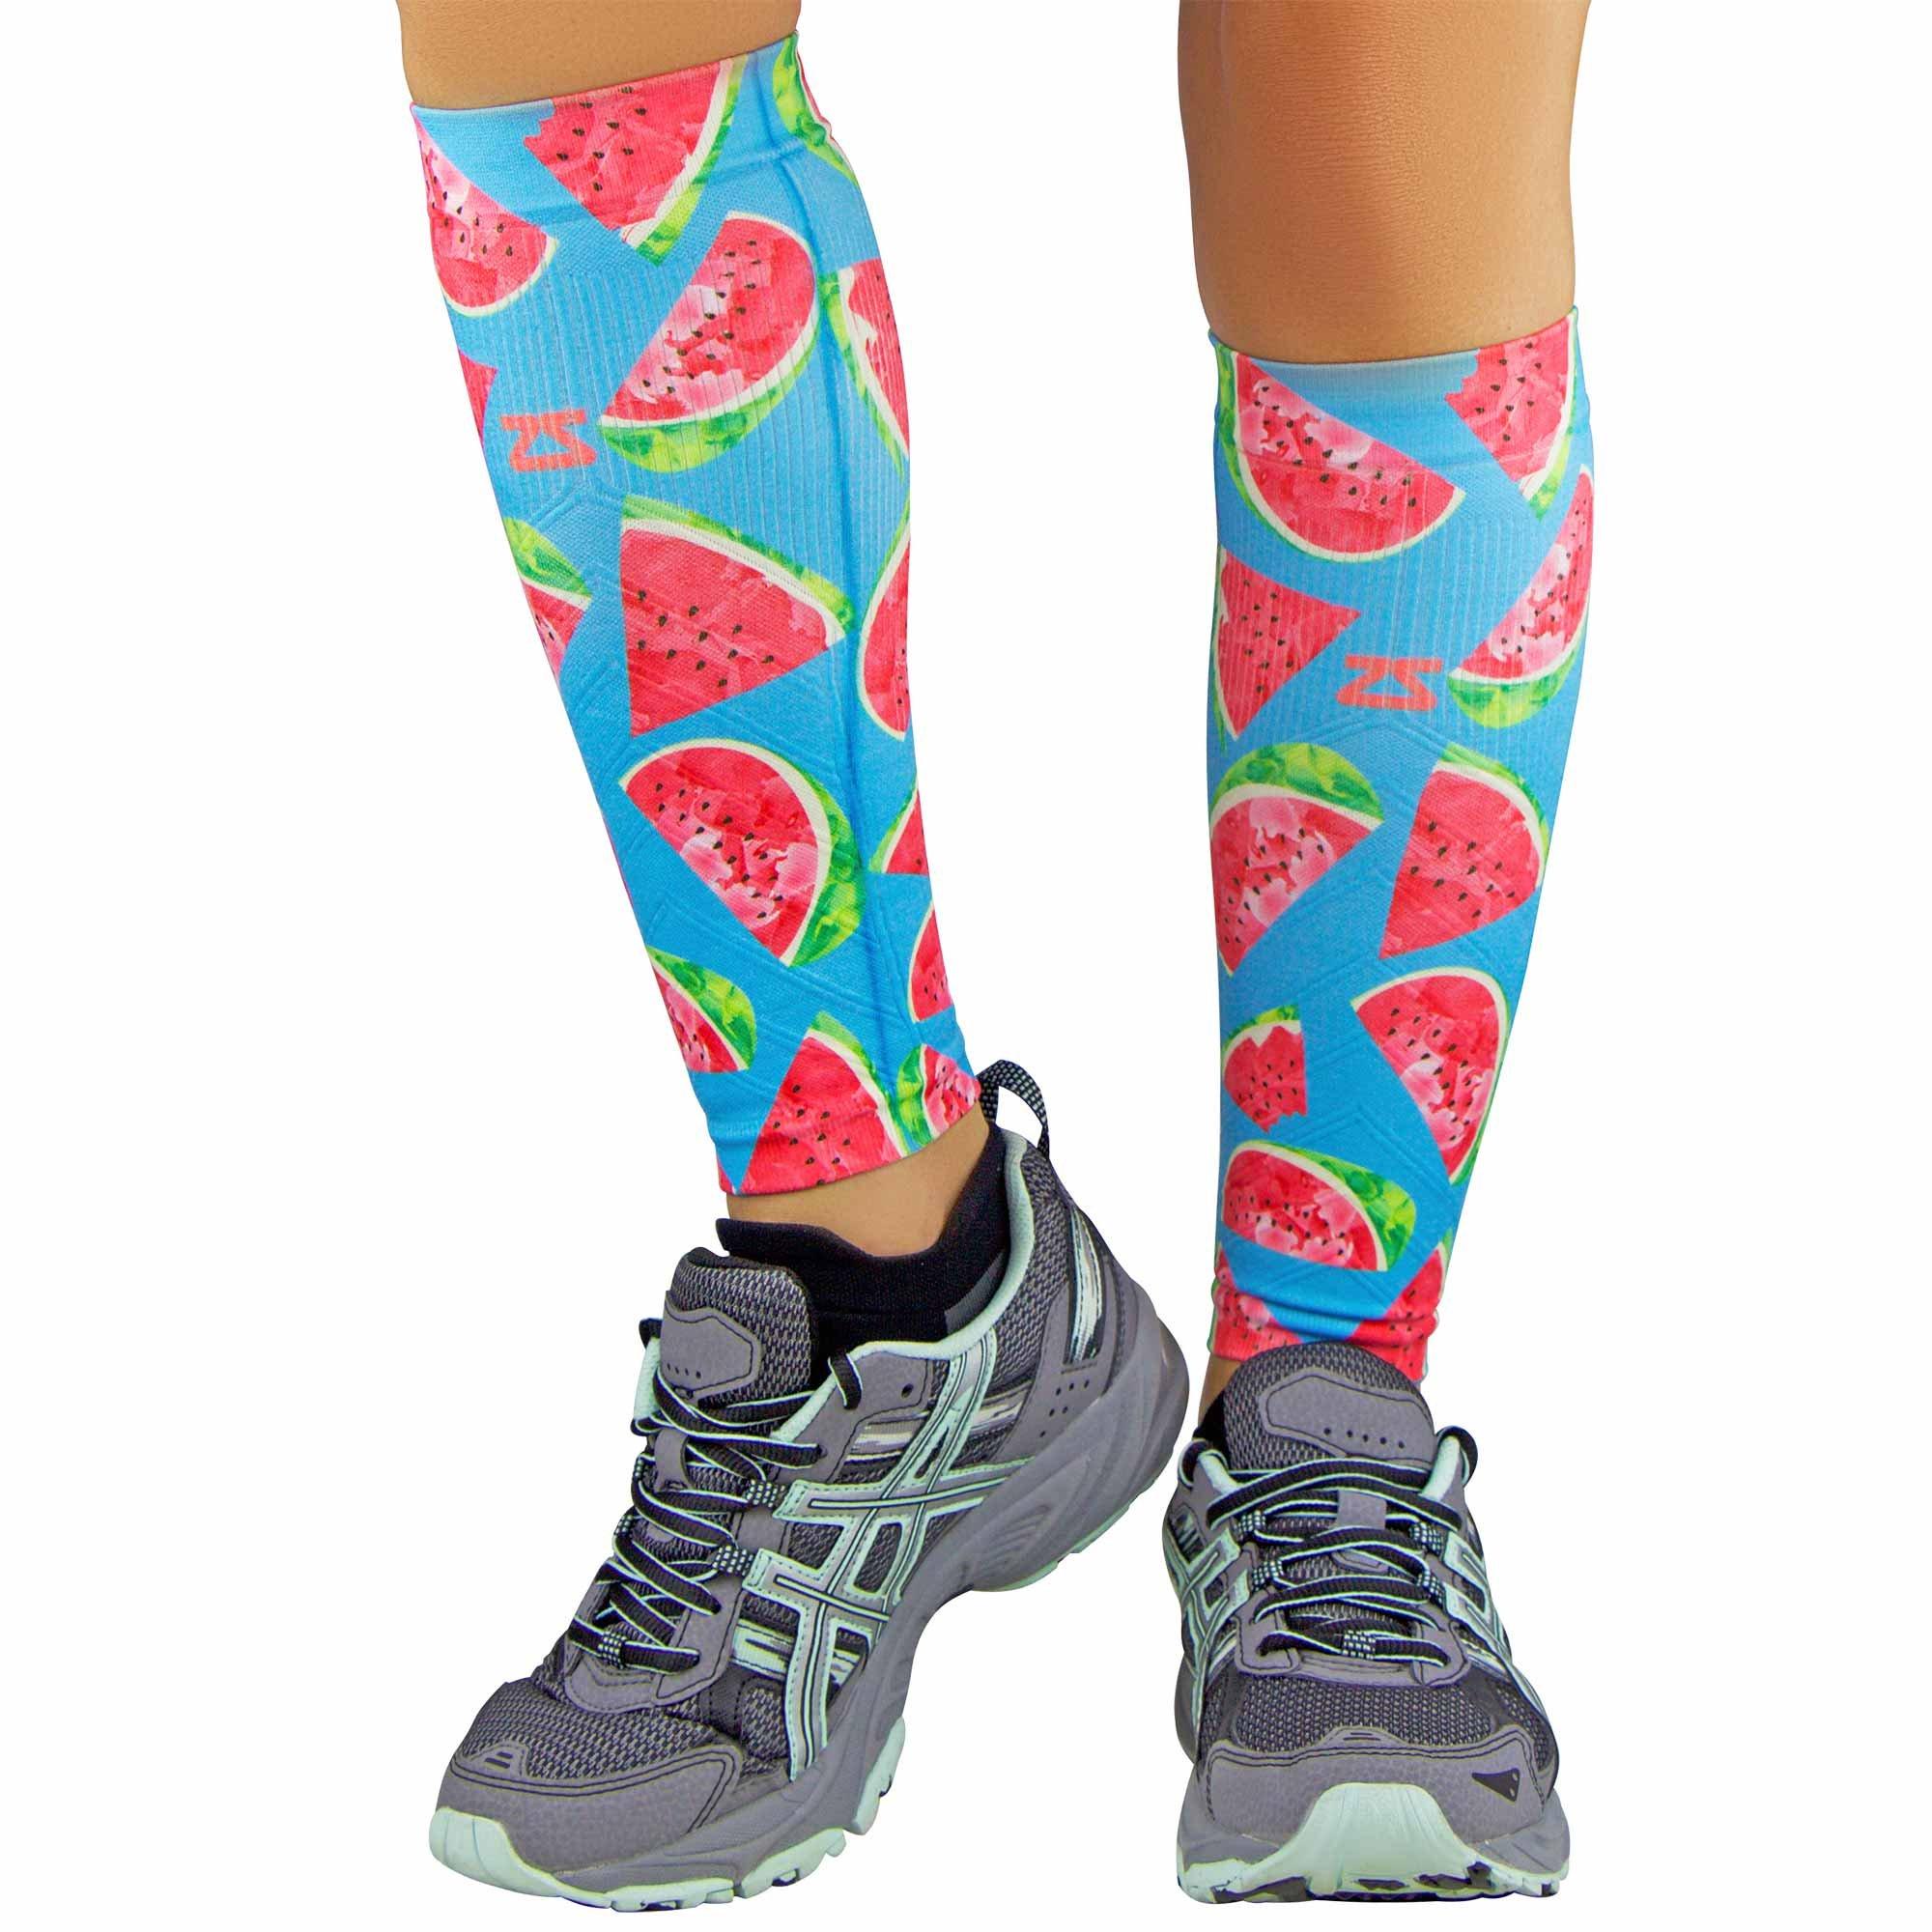 Zensah Print Compression Leg Sleeves - Watermelons // Aqua - S/M by Zensah